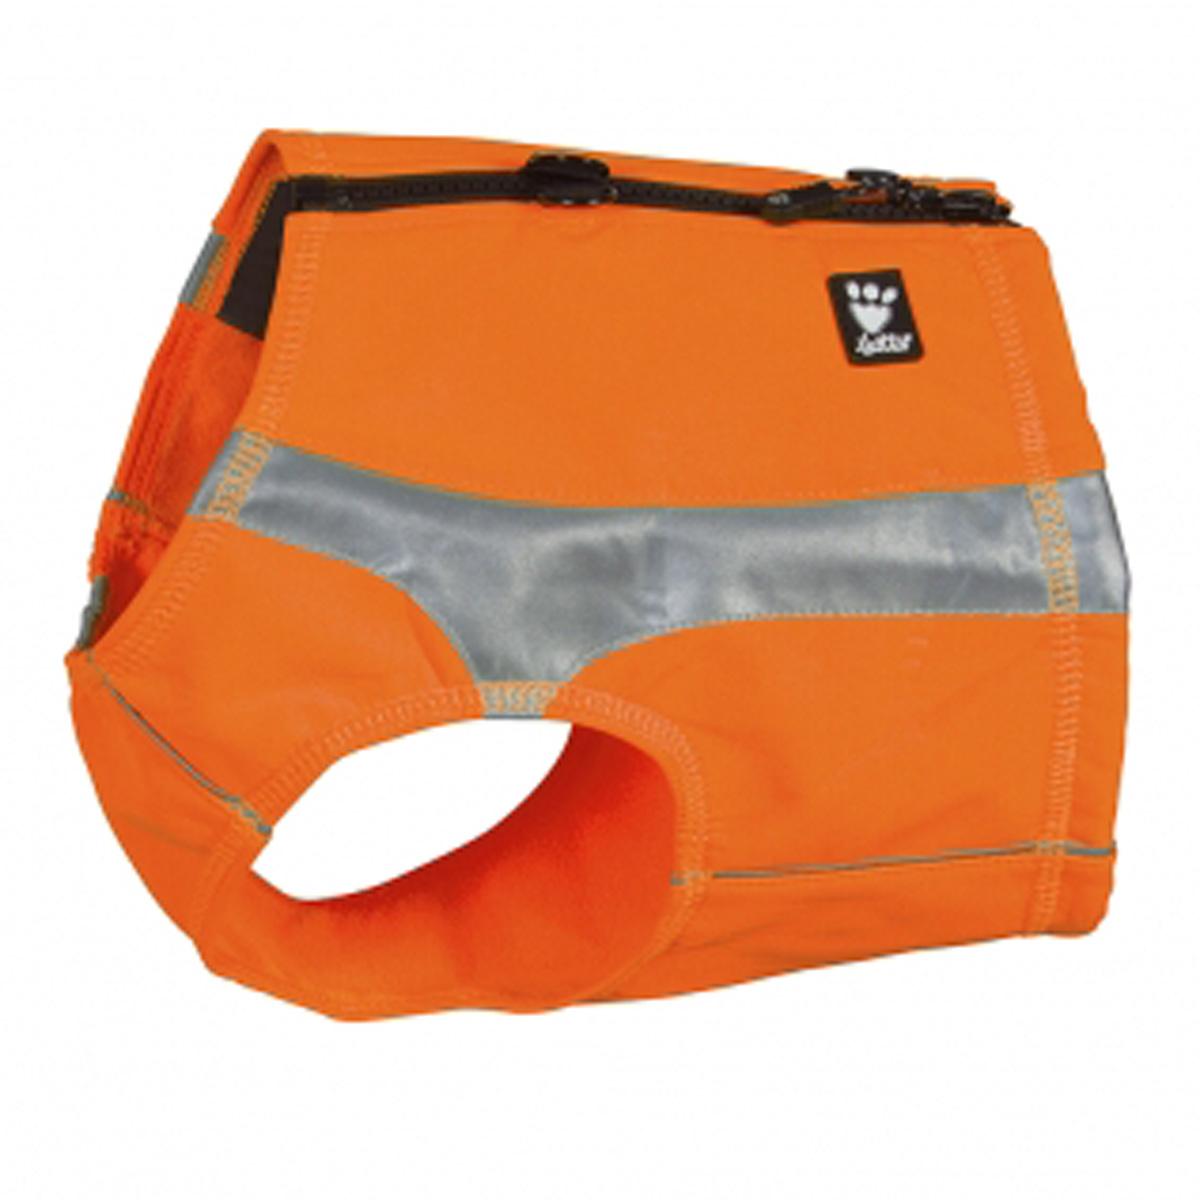 Hurtta Polar Visibility Dog Vest - Orange